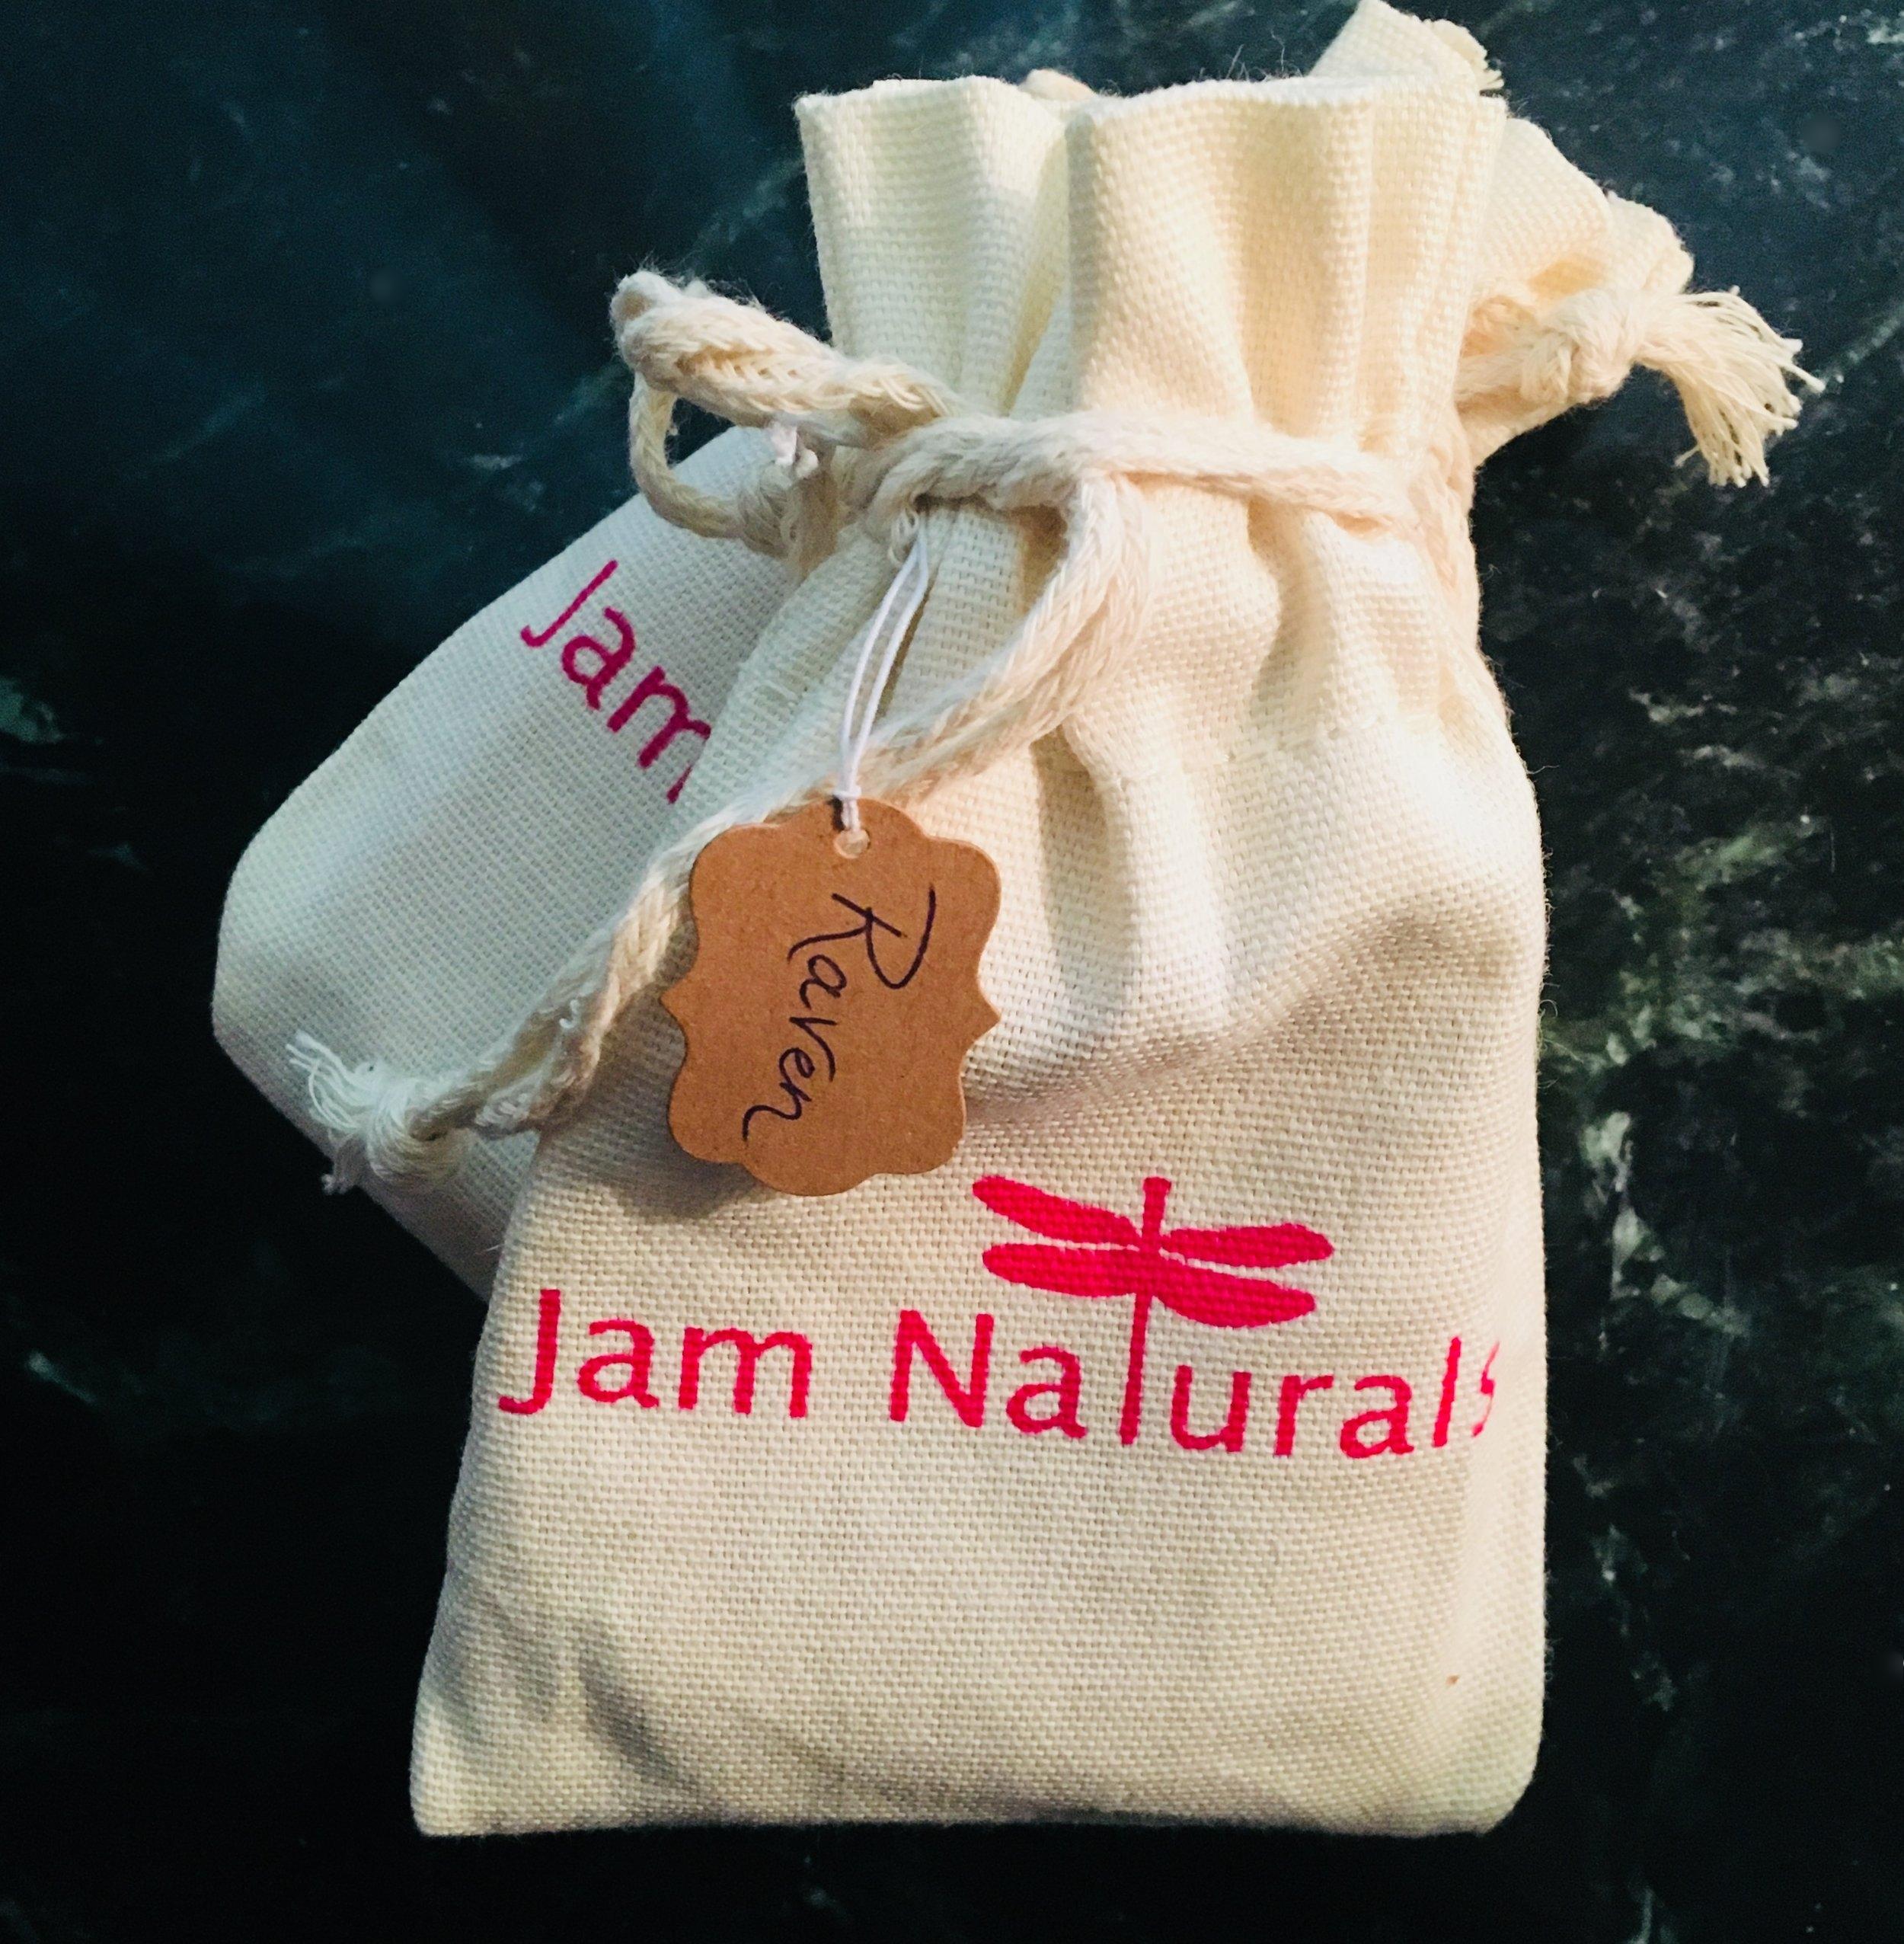 jam naturals teethers